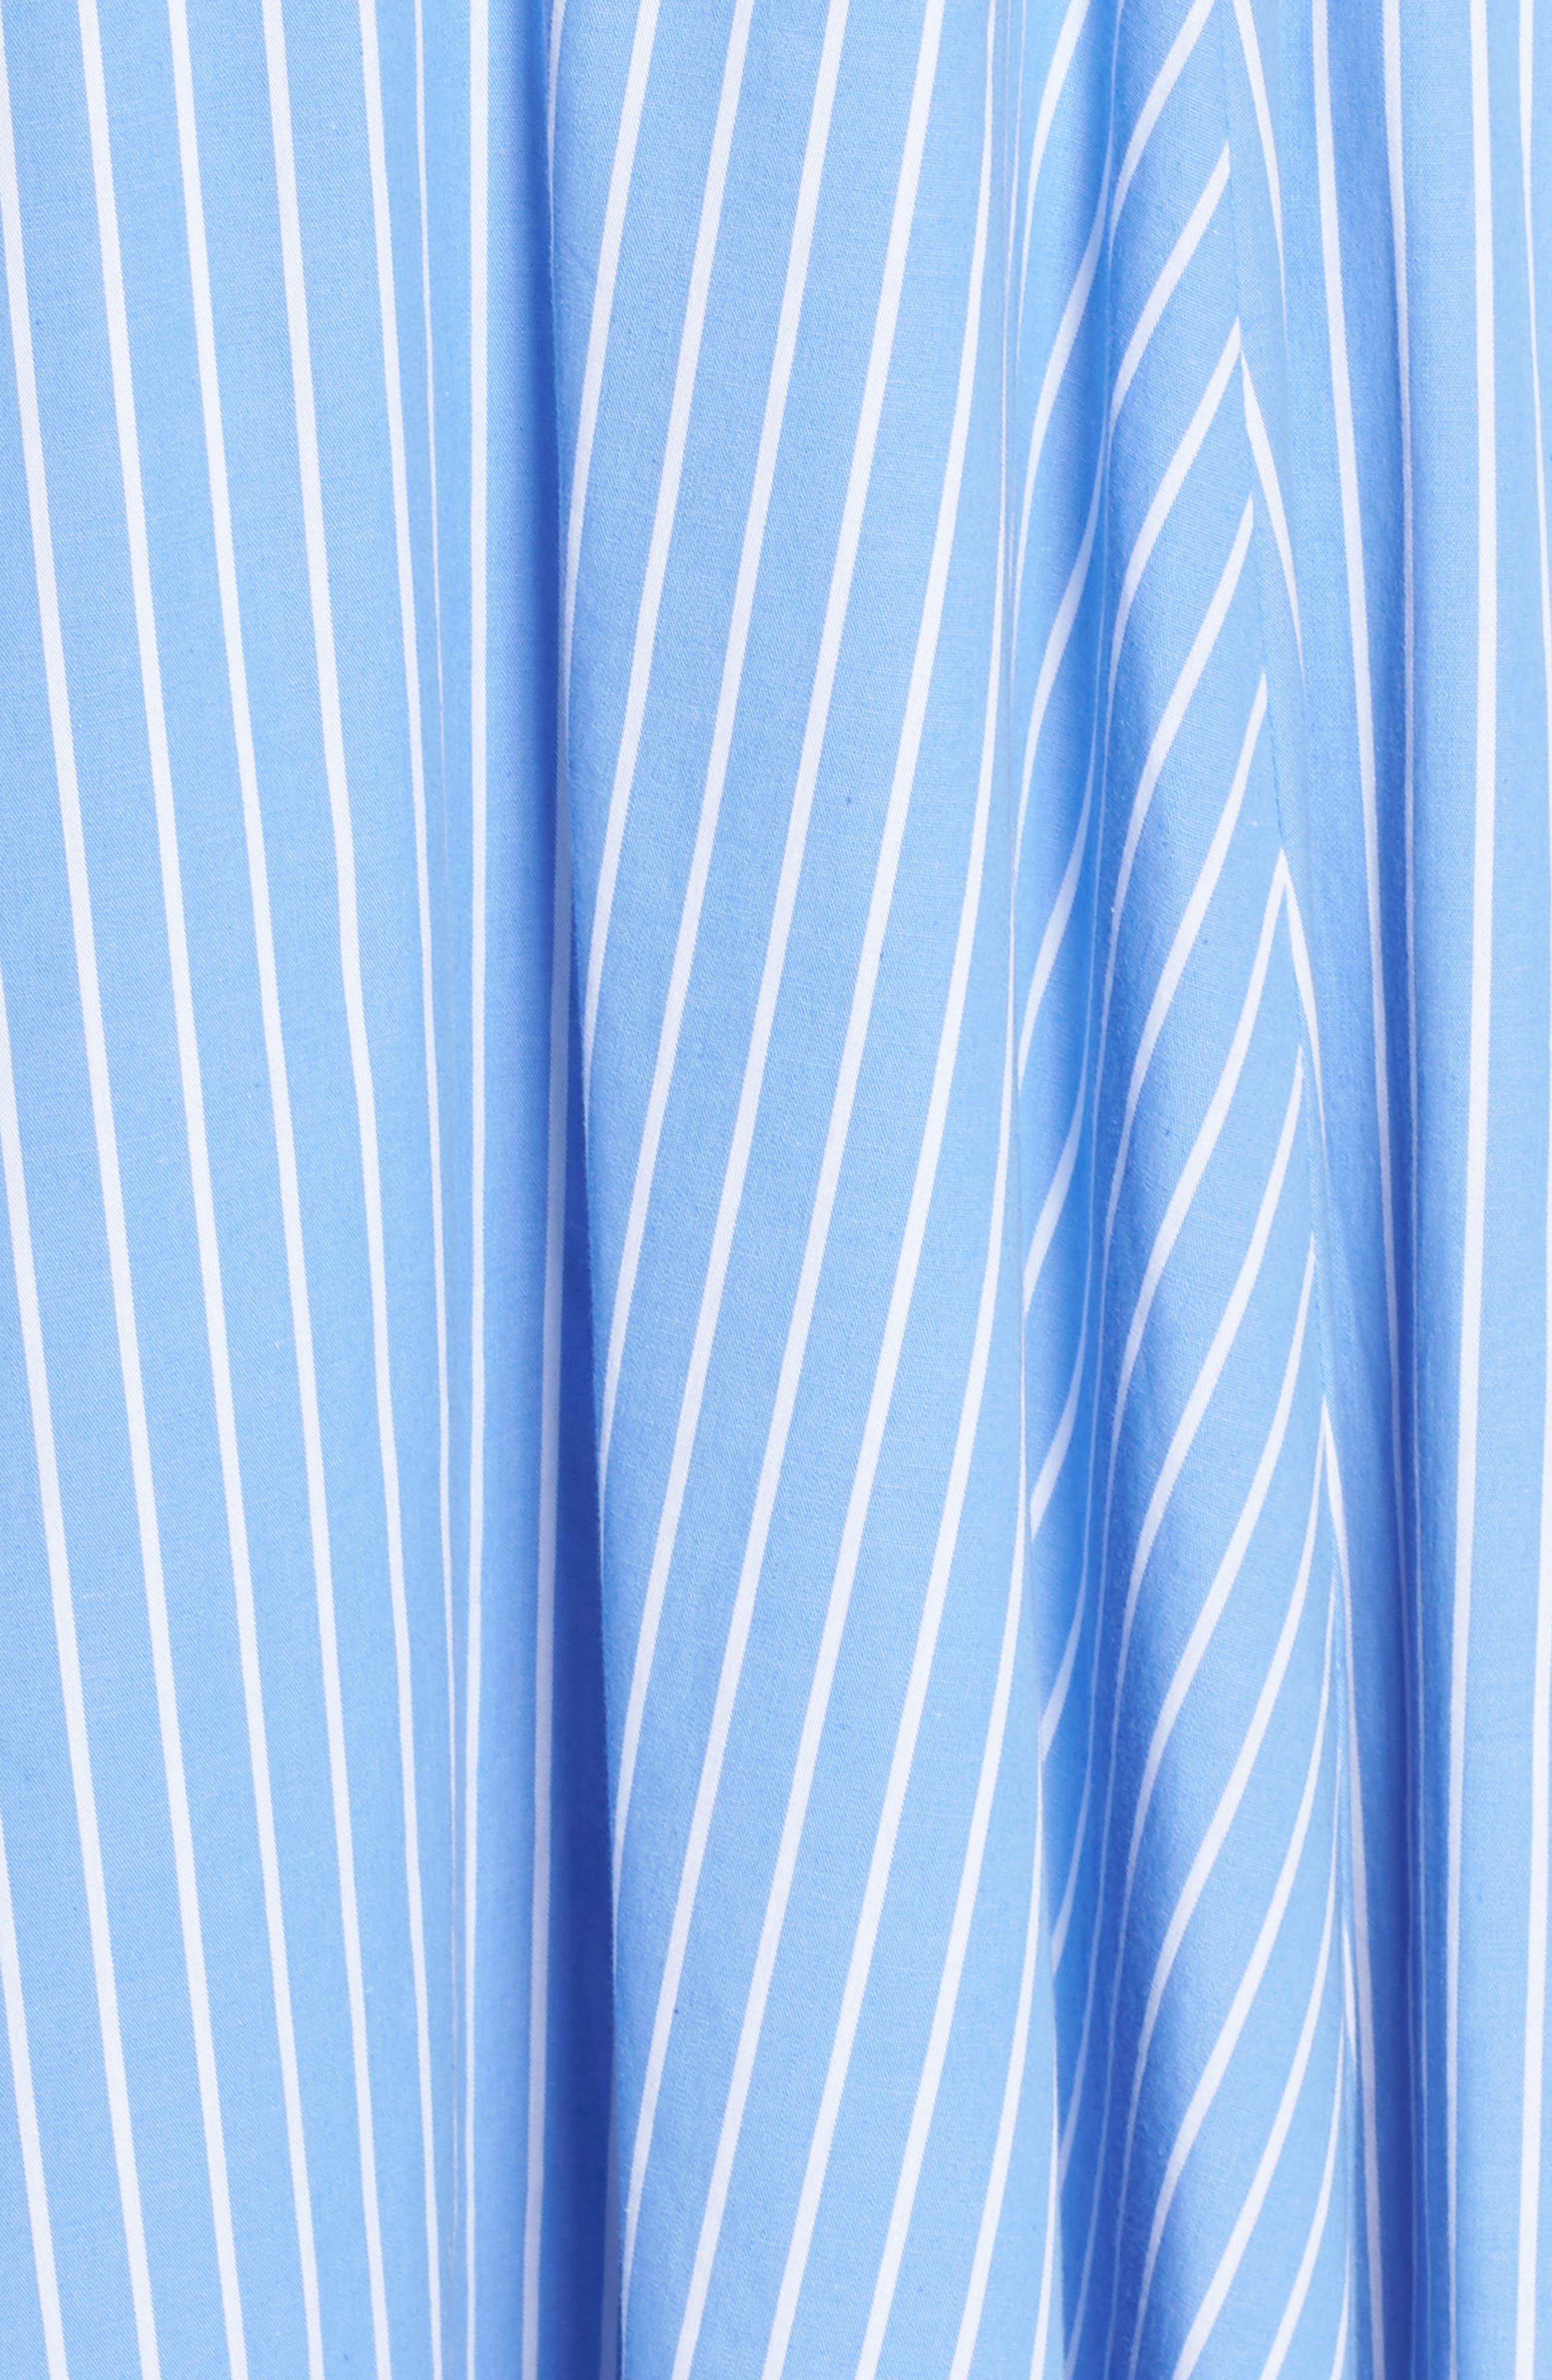 Morrow Stripe Corset Gown,                             Alternate thumbnail 6, color,                             Pale Blue/ White Stripe